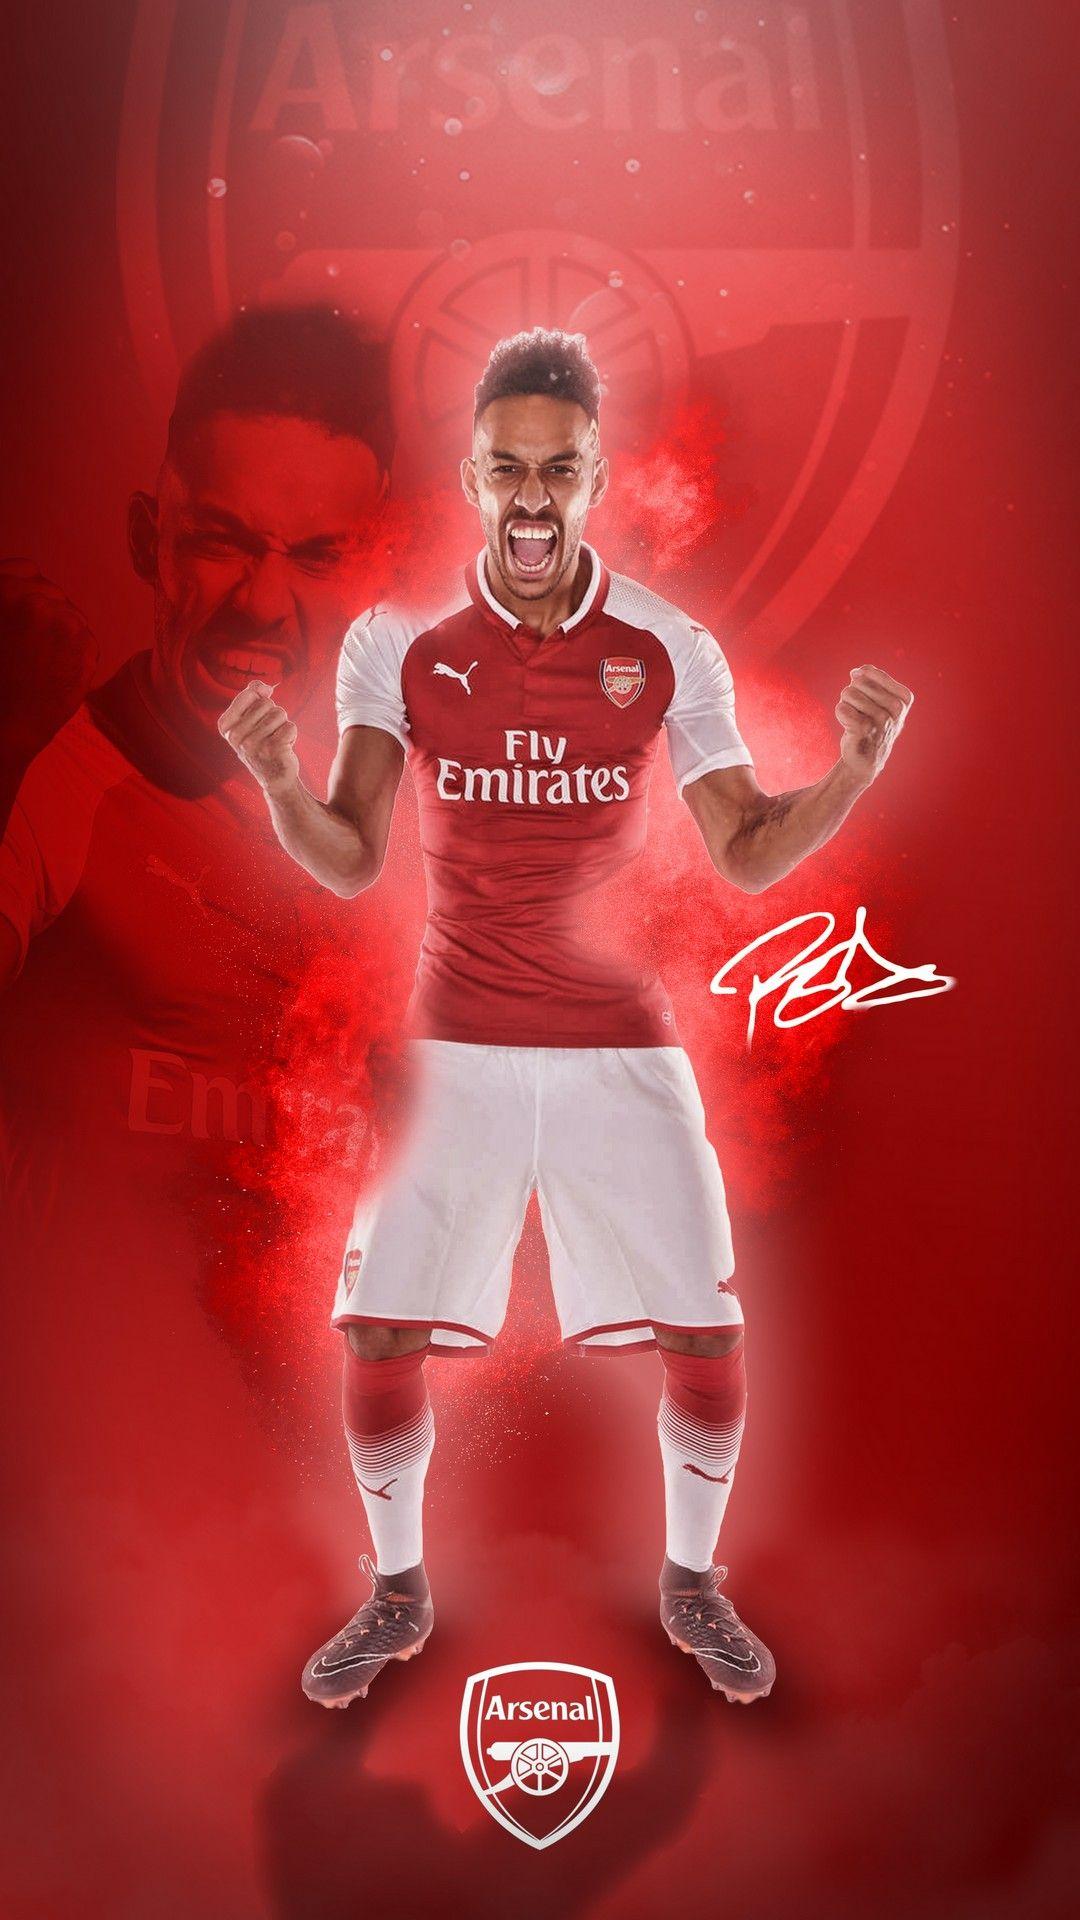 Aubameyang Arsenal Players Android Wallpaper Best Android Wallpapers Arsenal Wallpapers Aubameyang Arsenal Arsenal Players